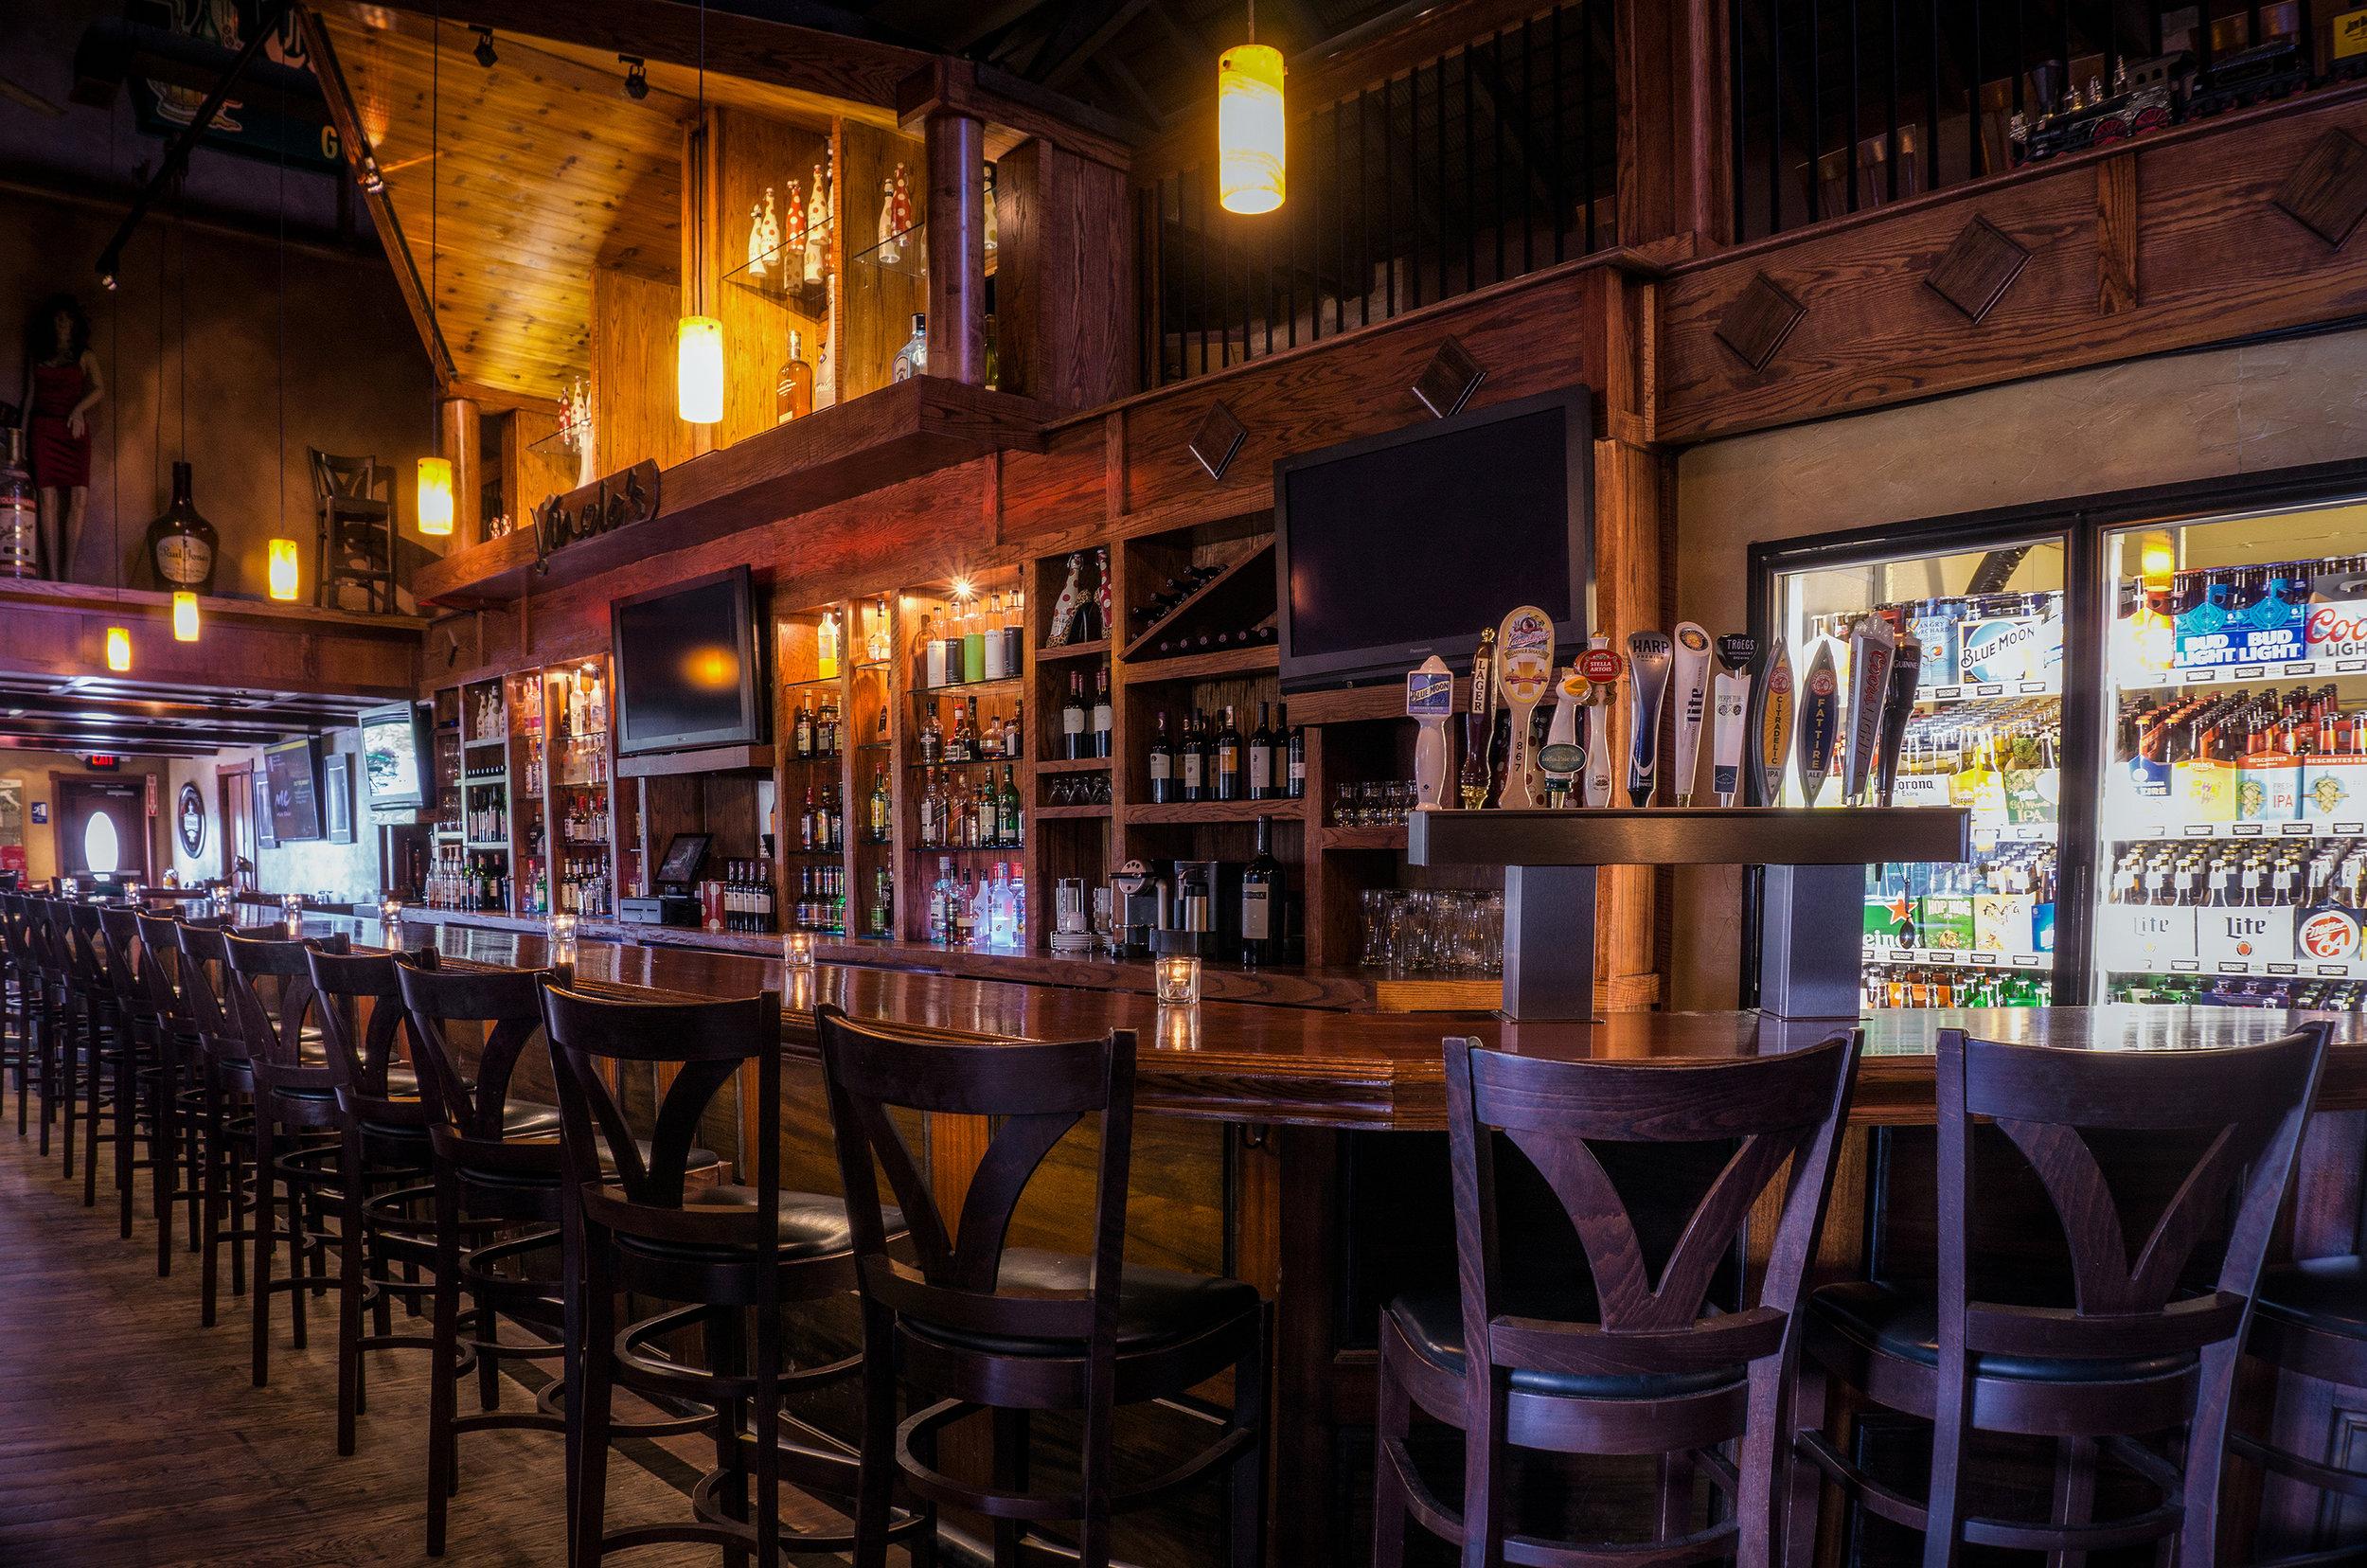 Images captured for Vinola's Restaurant in Leola, Pa.